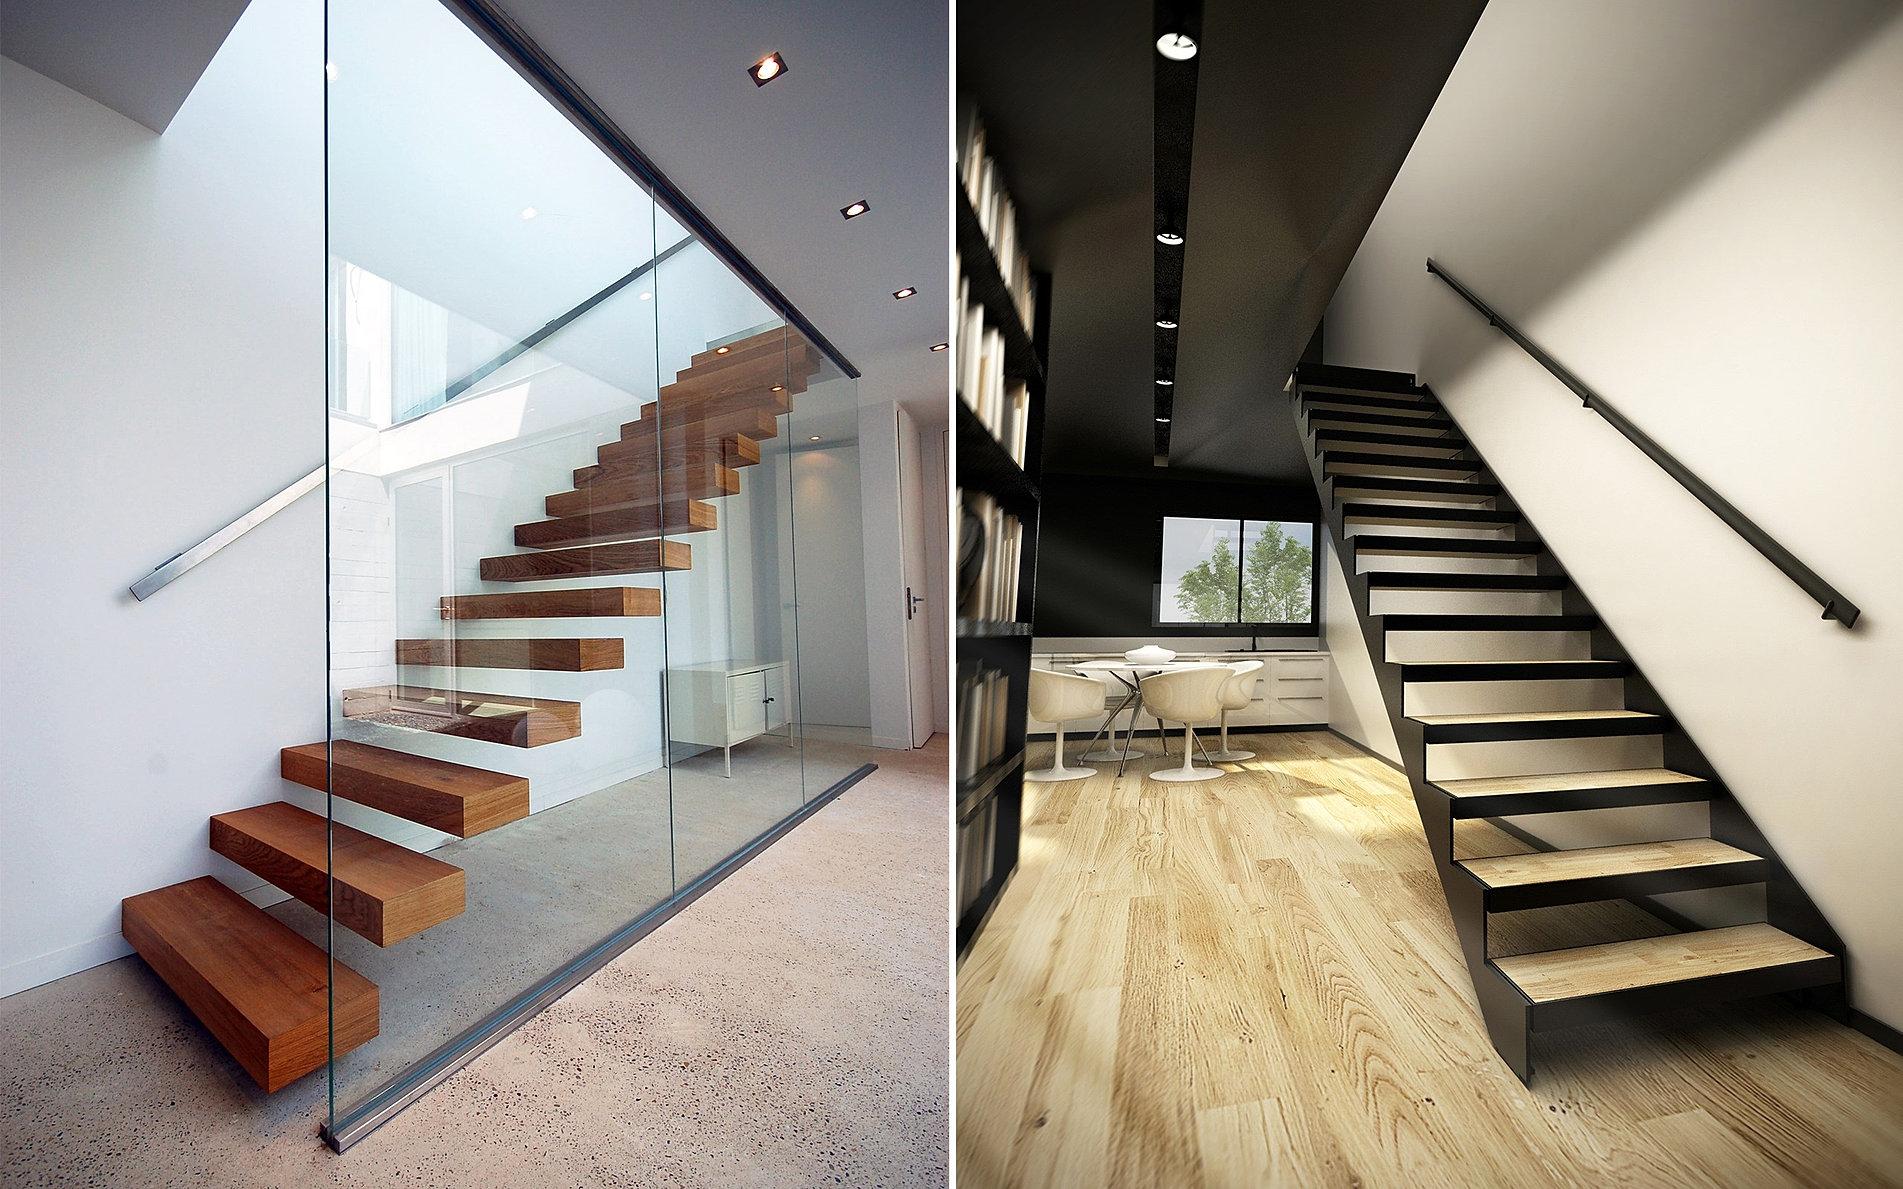 mon devis escalier. Black Bedroom Furniture Sets. Home Design Ideas